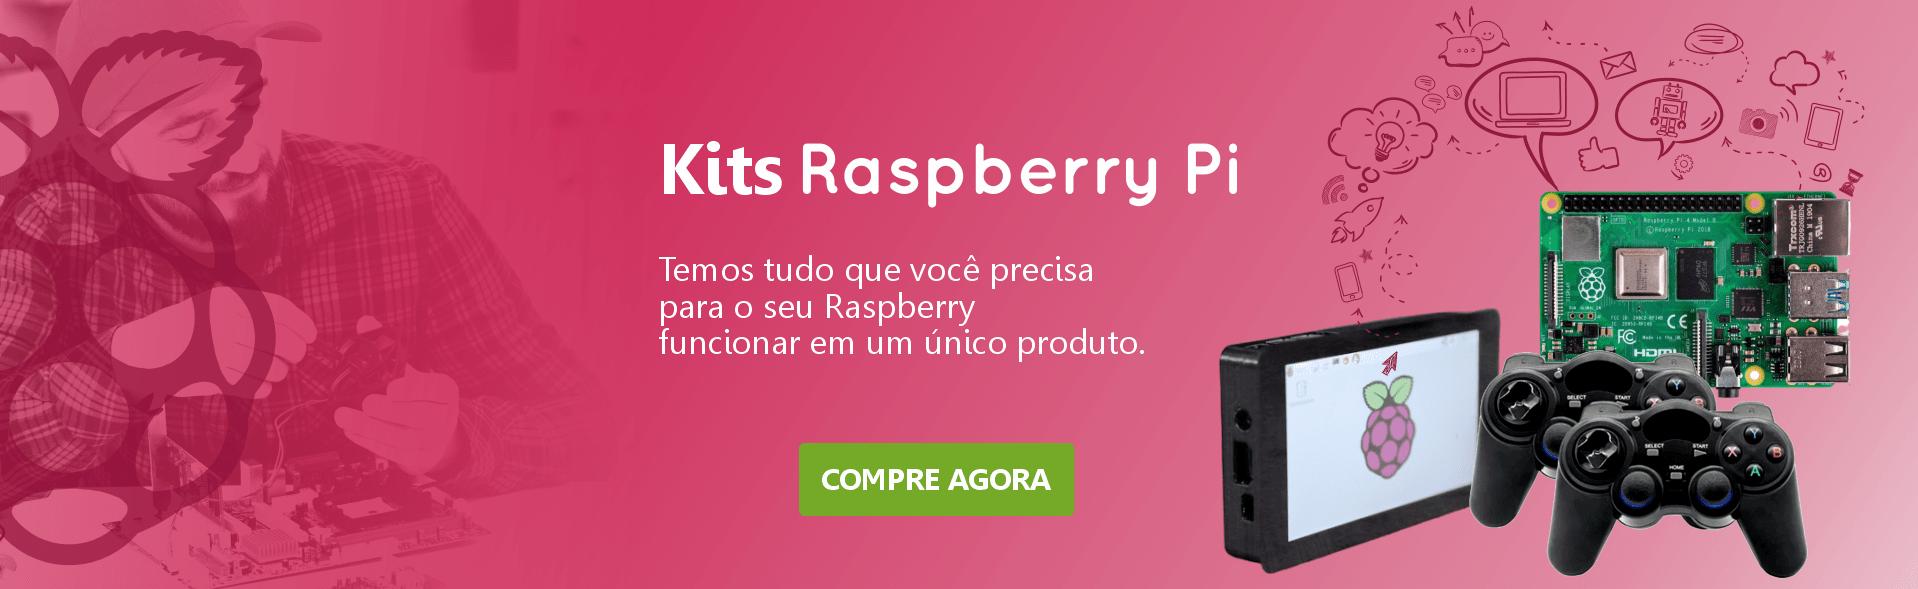 Kit Raspberry 2020